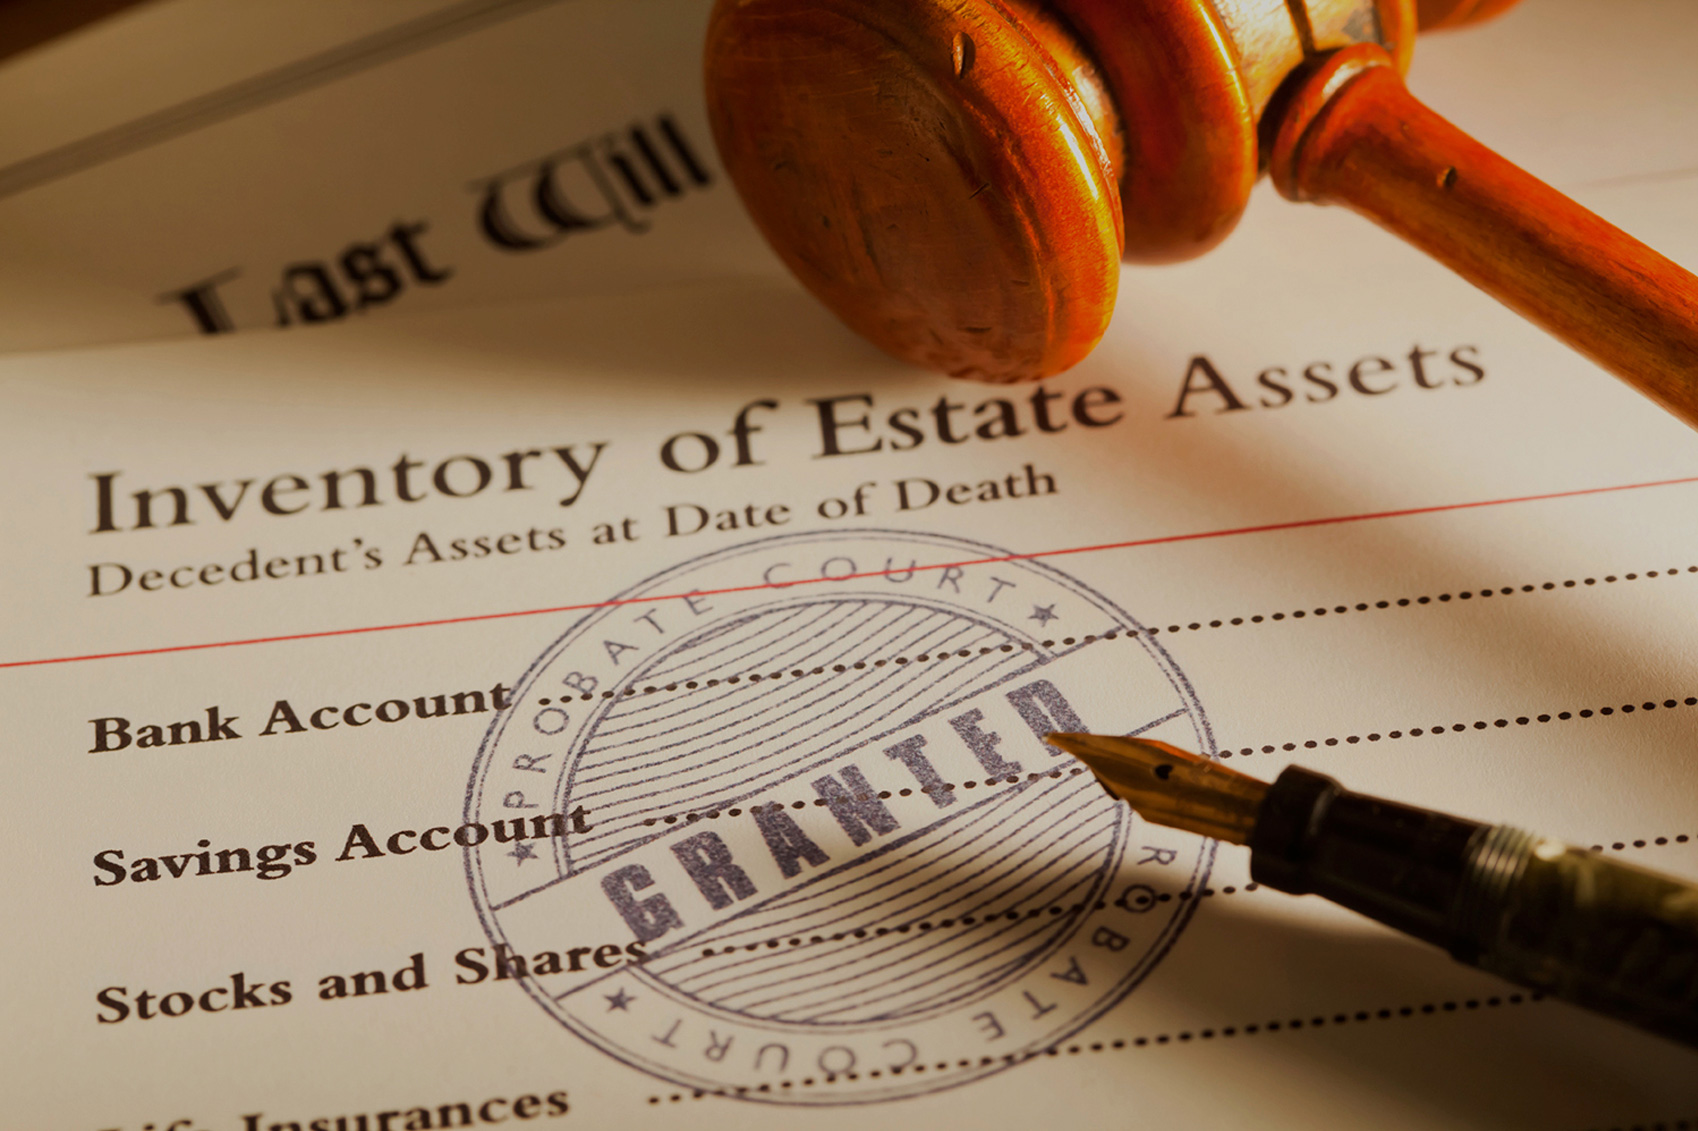 Probate In Florida - Millhorn, Shanawany & Olsen Law Firm